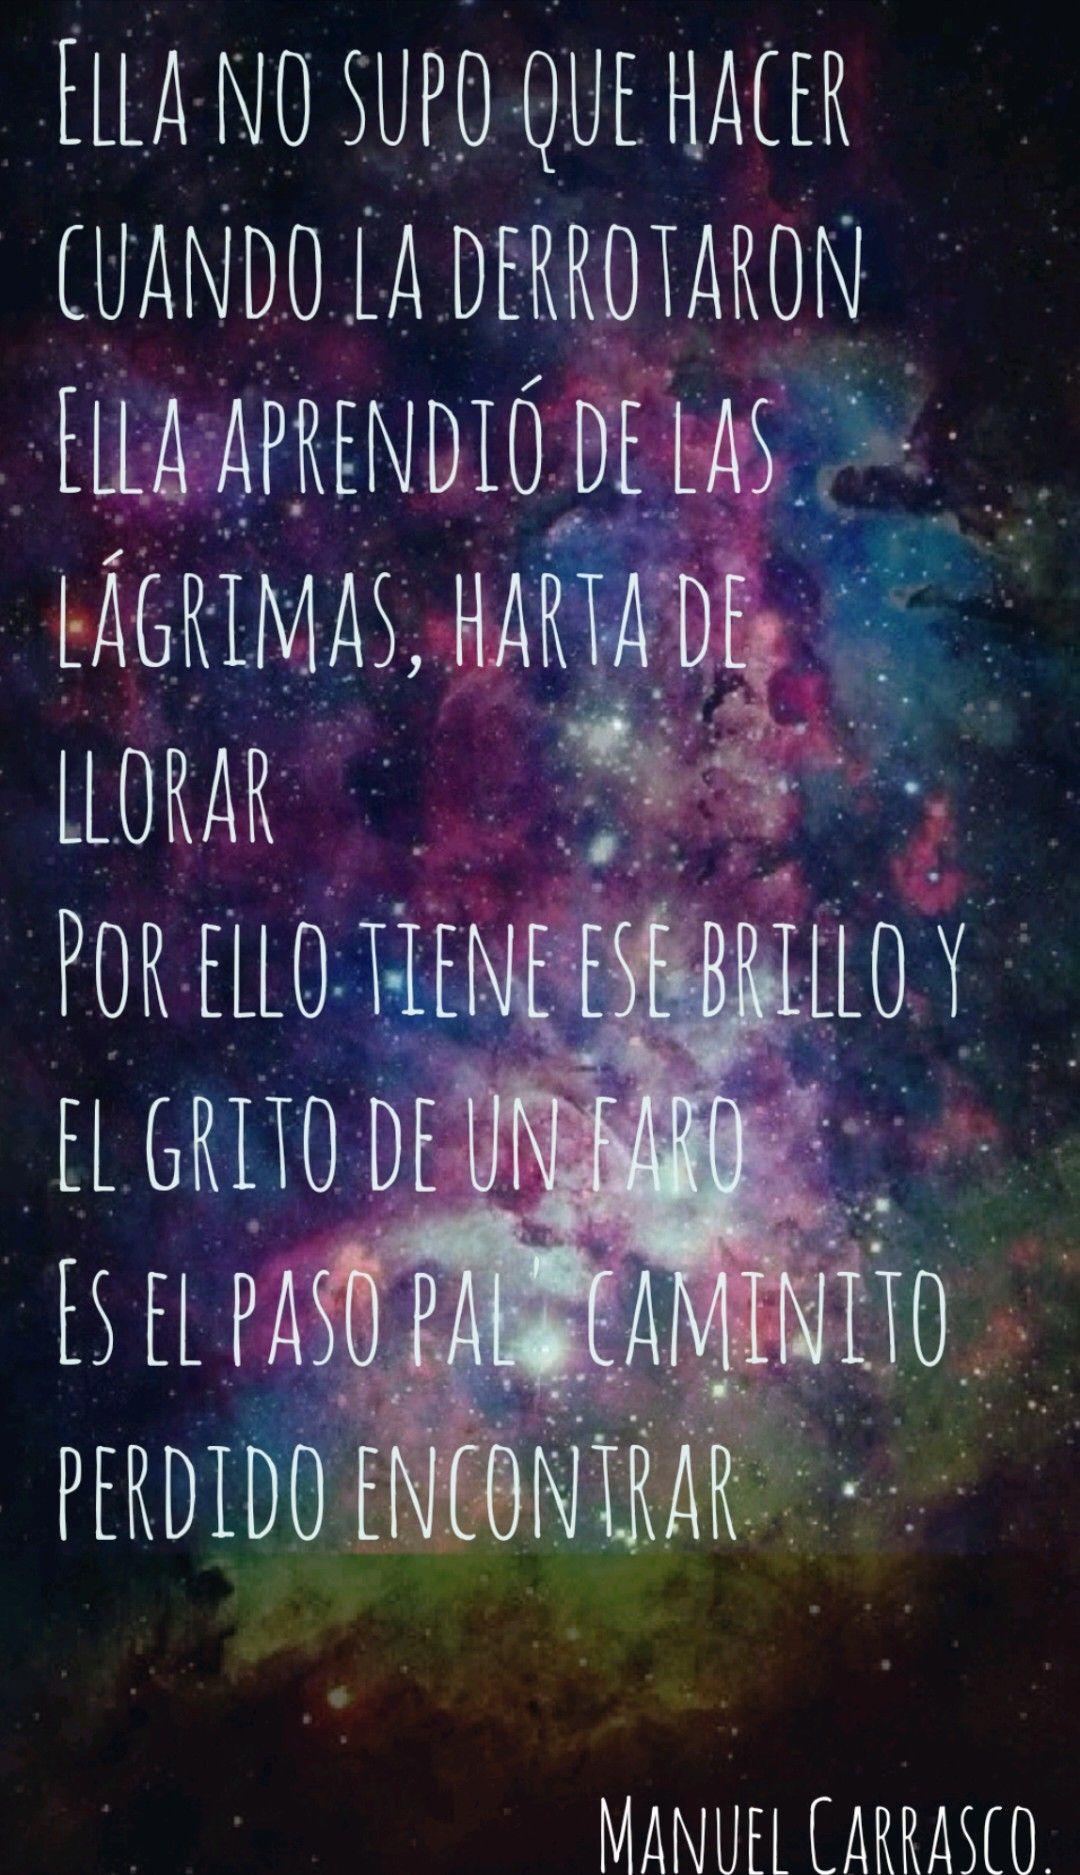 Frases Manuel Carrasco Que Bonito Es Querer Frases De